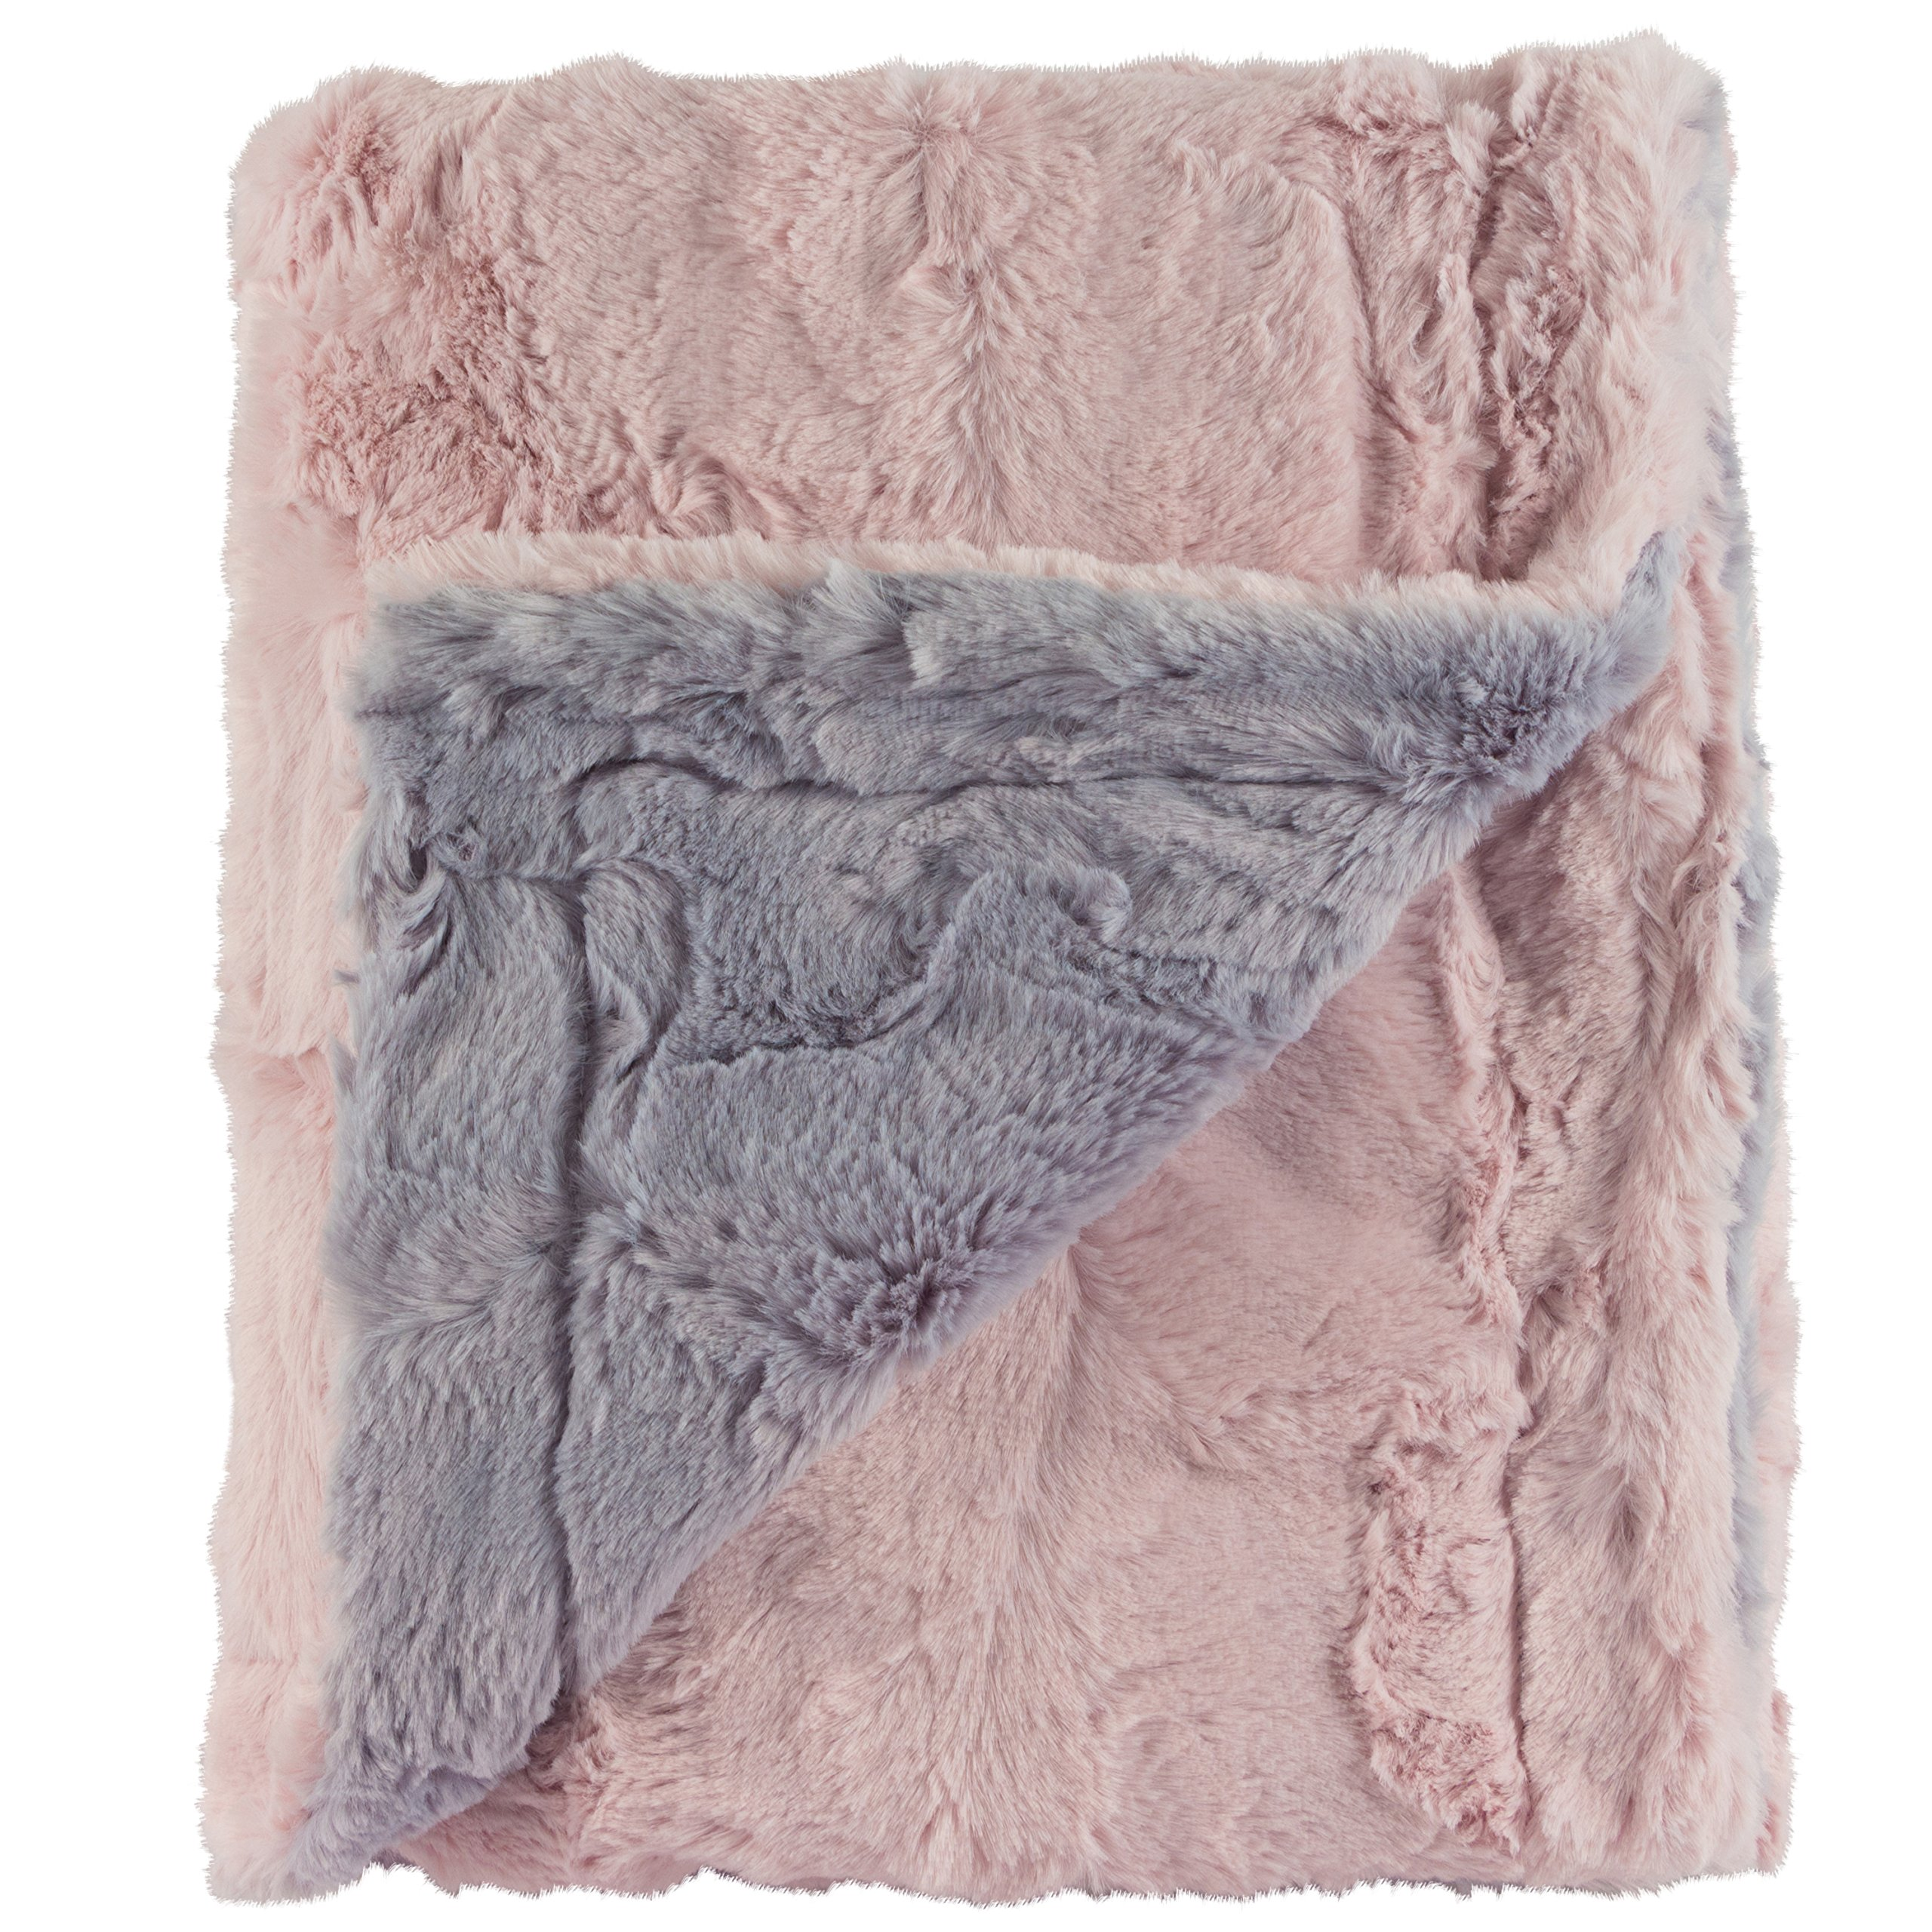 e9ead04512 Amazon.com  Ultra Soft Baby Receiving Blanket - Luscious